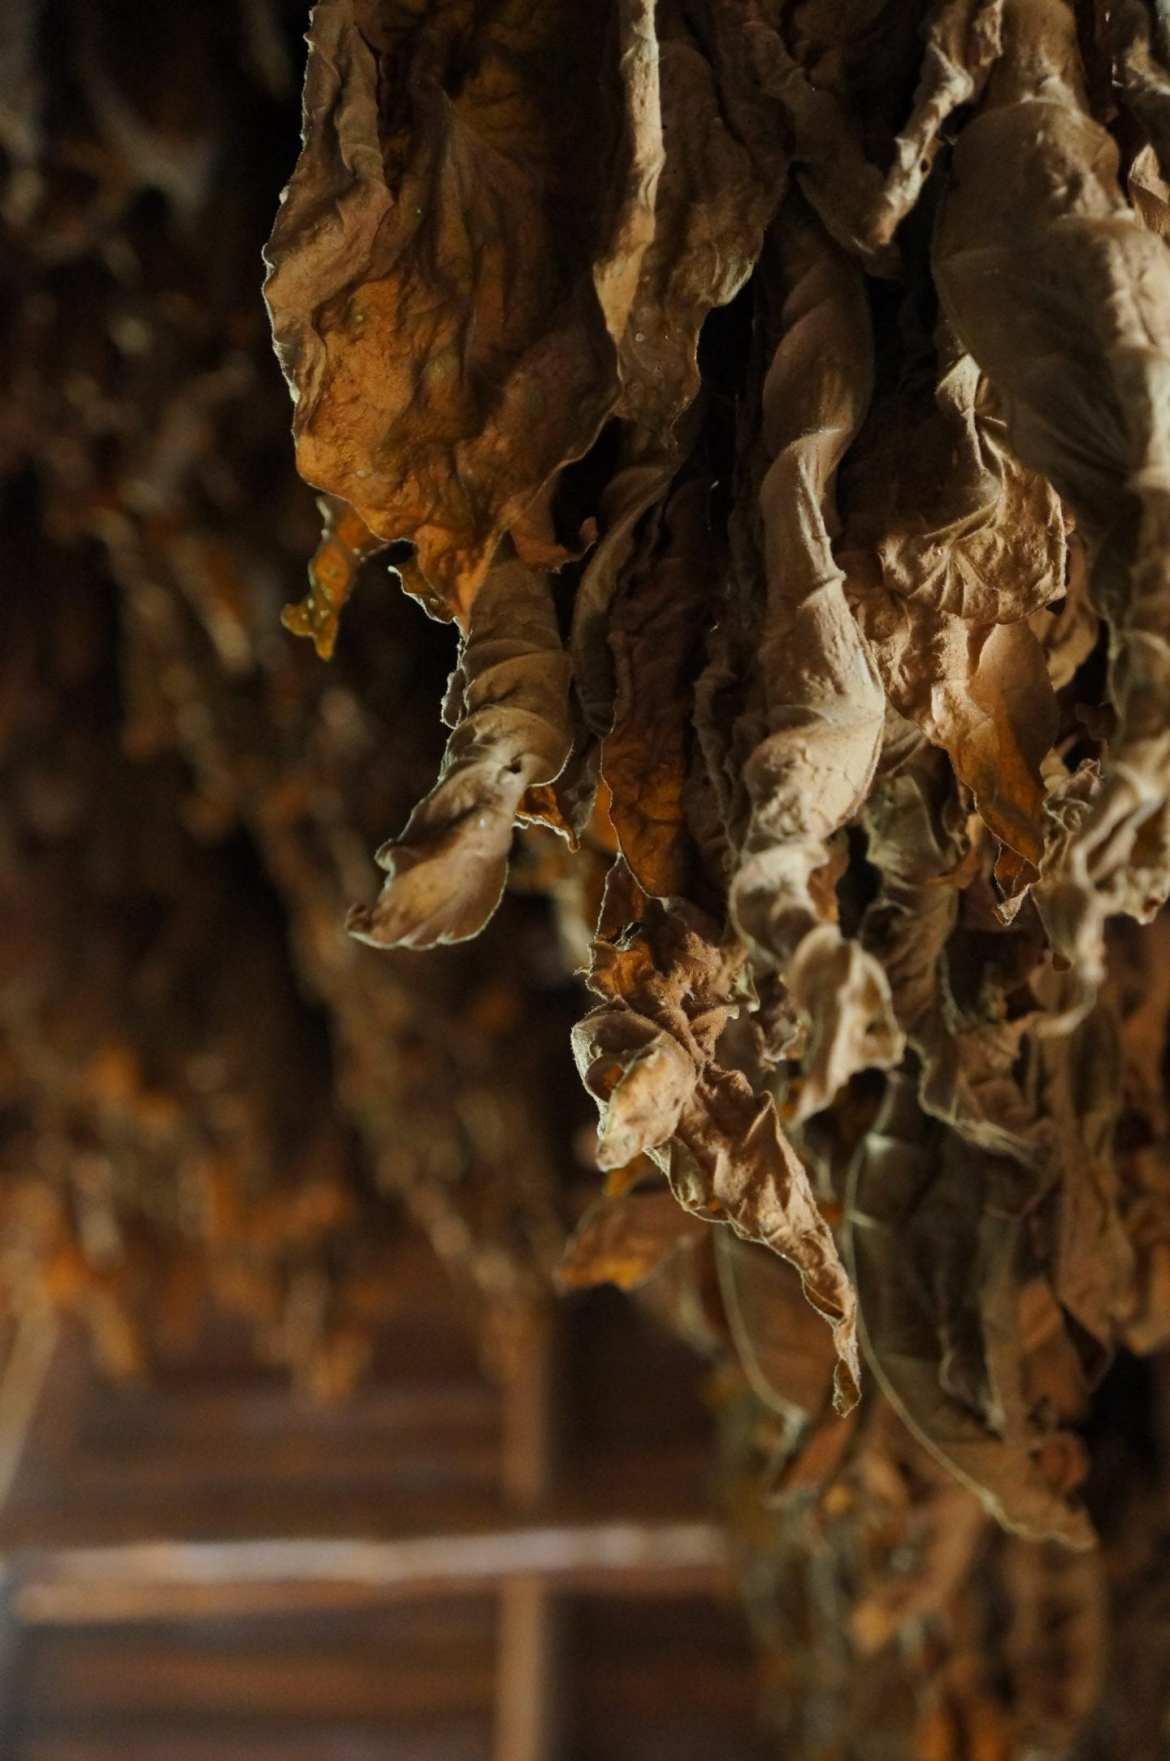 tobacco leaves drying in vinales, cuba